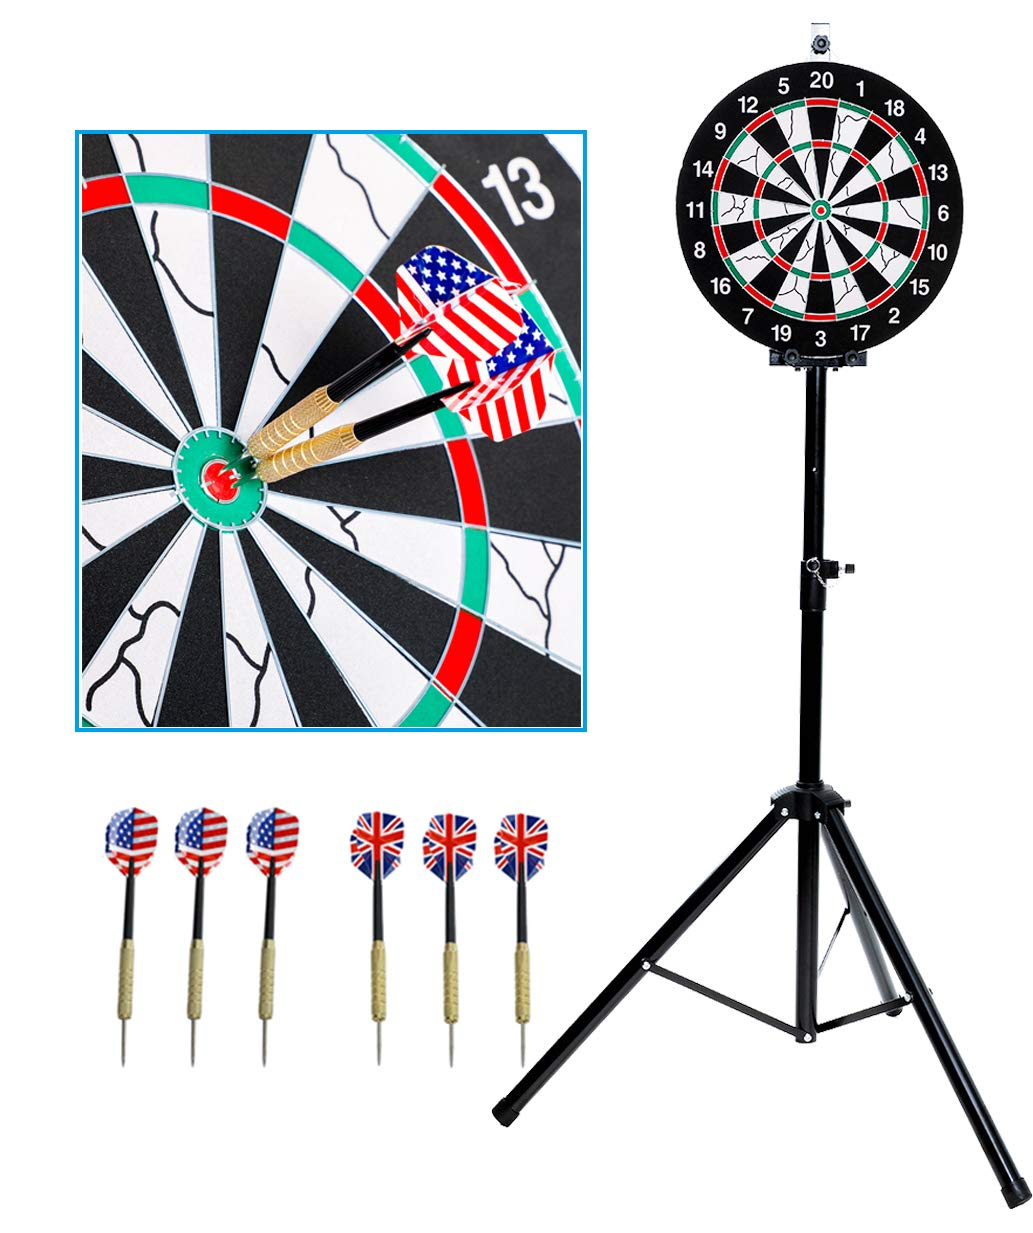 SPRAWL Portable Dart Board Stand-One